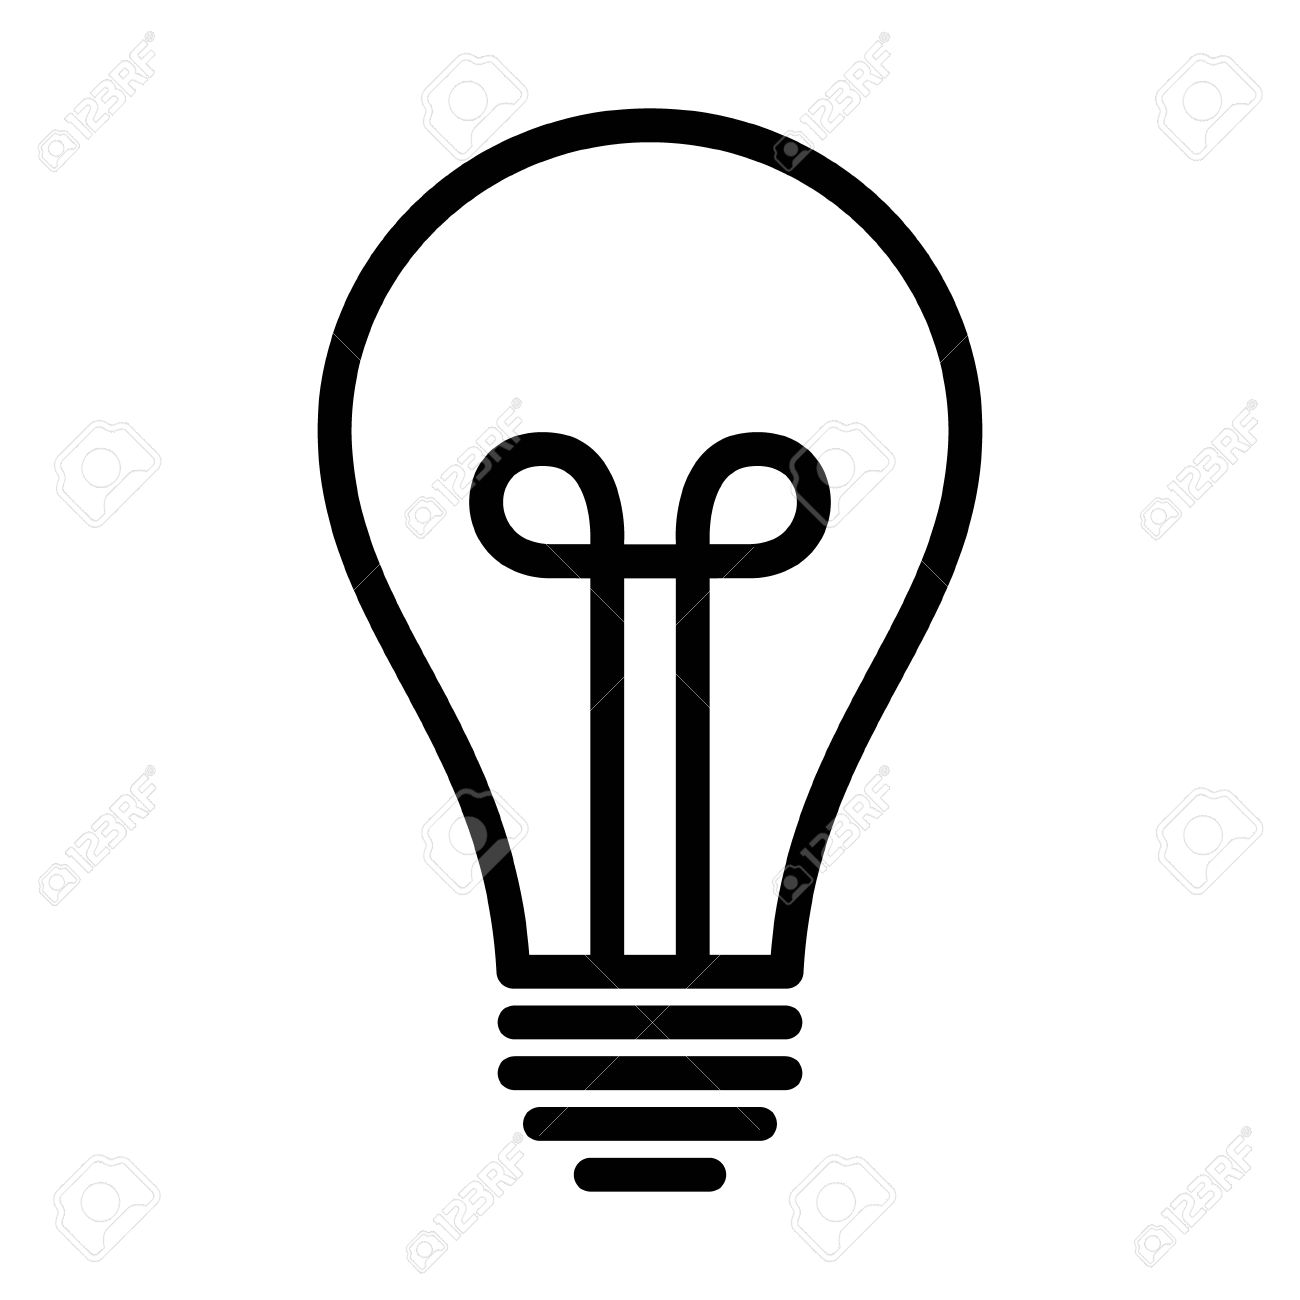 Vintage Light Bulb Lightbulb Turned Off Or Idea Line Art Icon For Apps And Websites